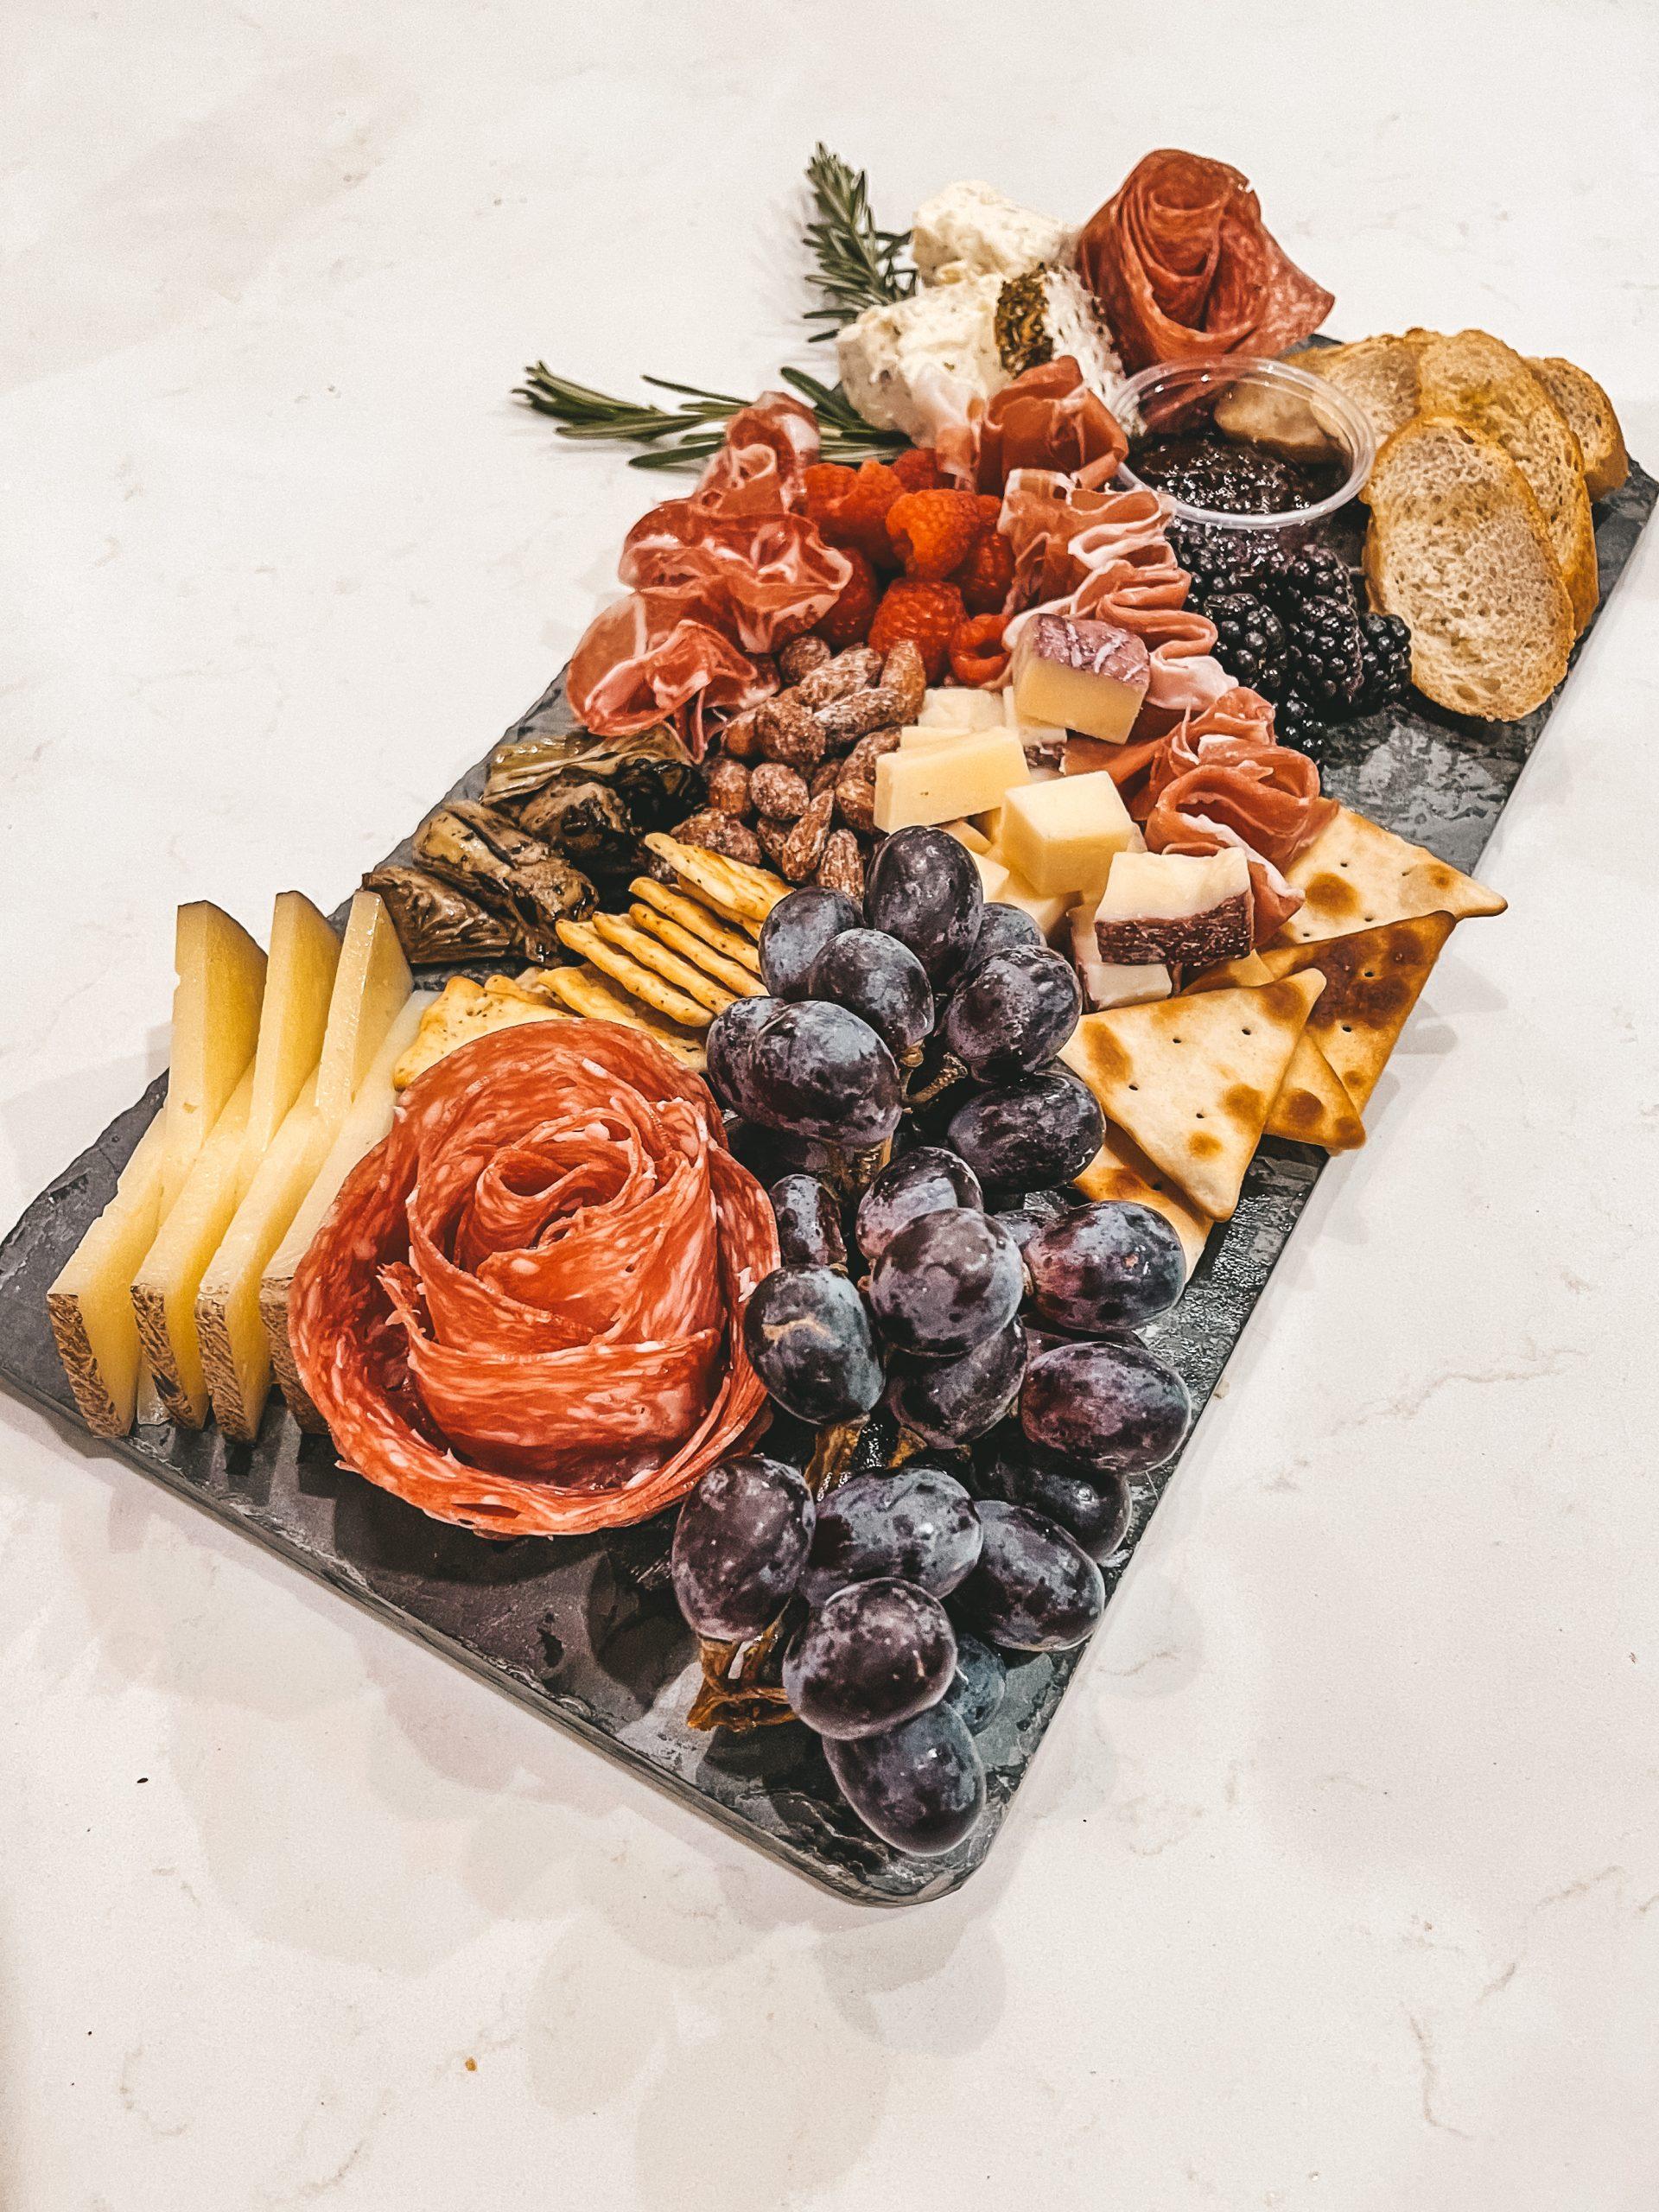 slate cheese charcuterie board fruit crackers Boursin cheese angela lanter